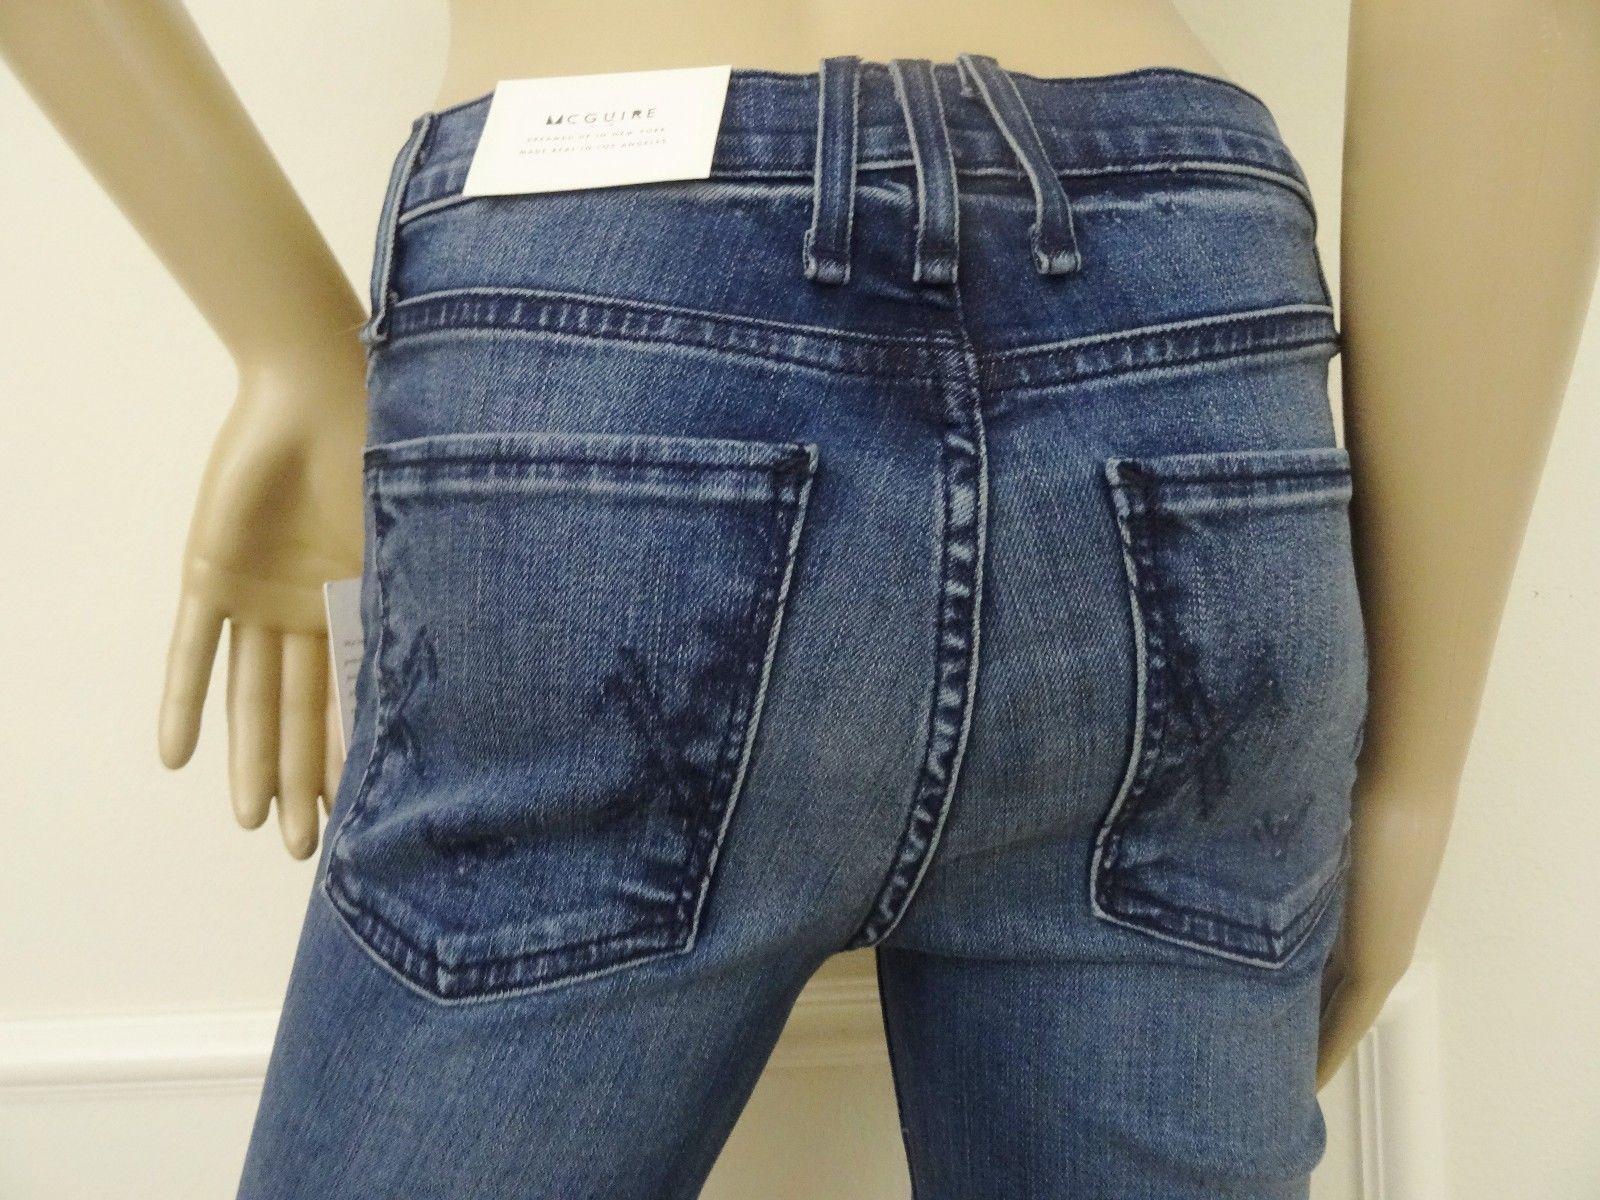 Nwt McGuire 788 Gainsbourg High Waist Stretch Bootcut Denim Jeans Sz 25 0 Molino